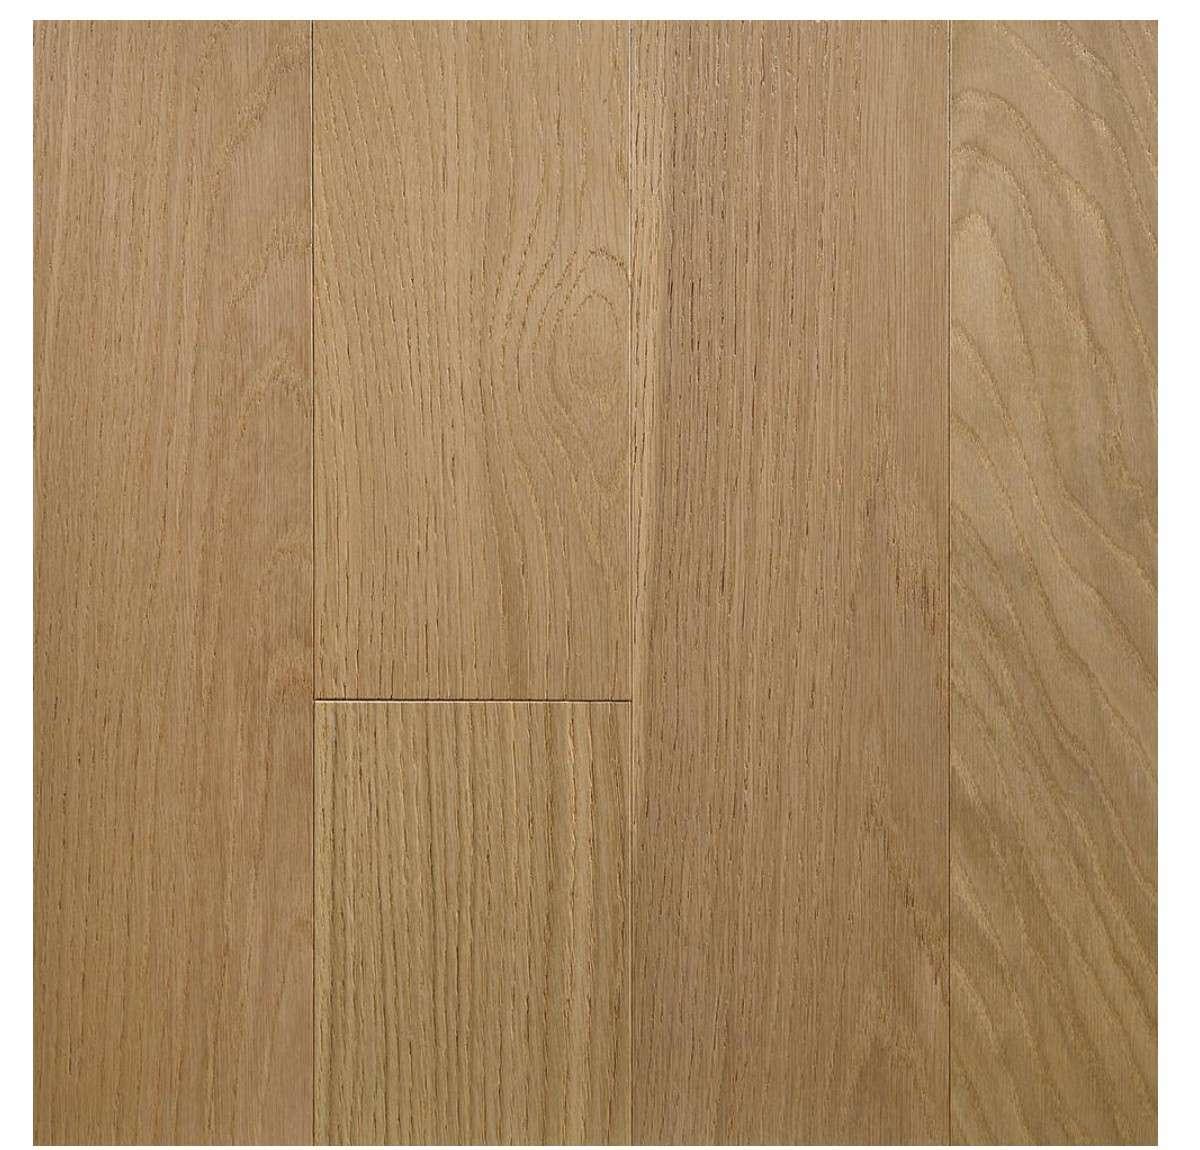 OptiWood Waterproof Engineered Hardwood Flooring